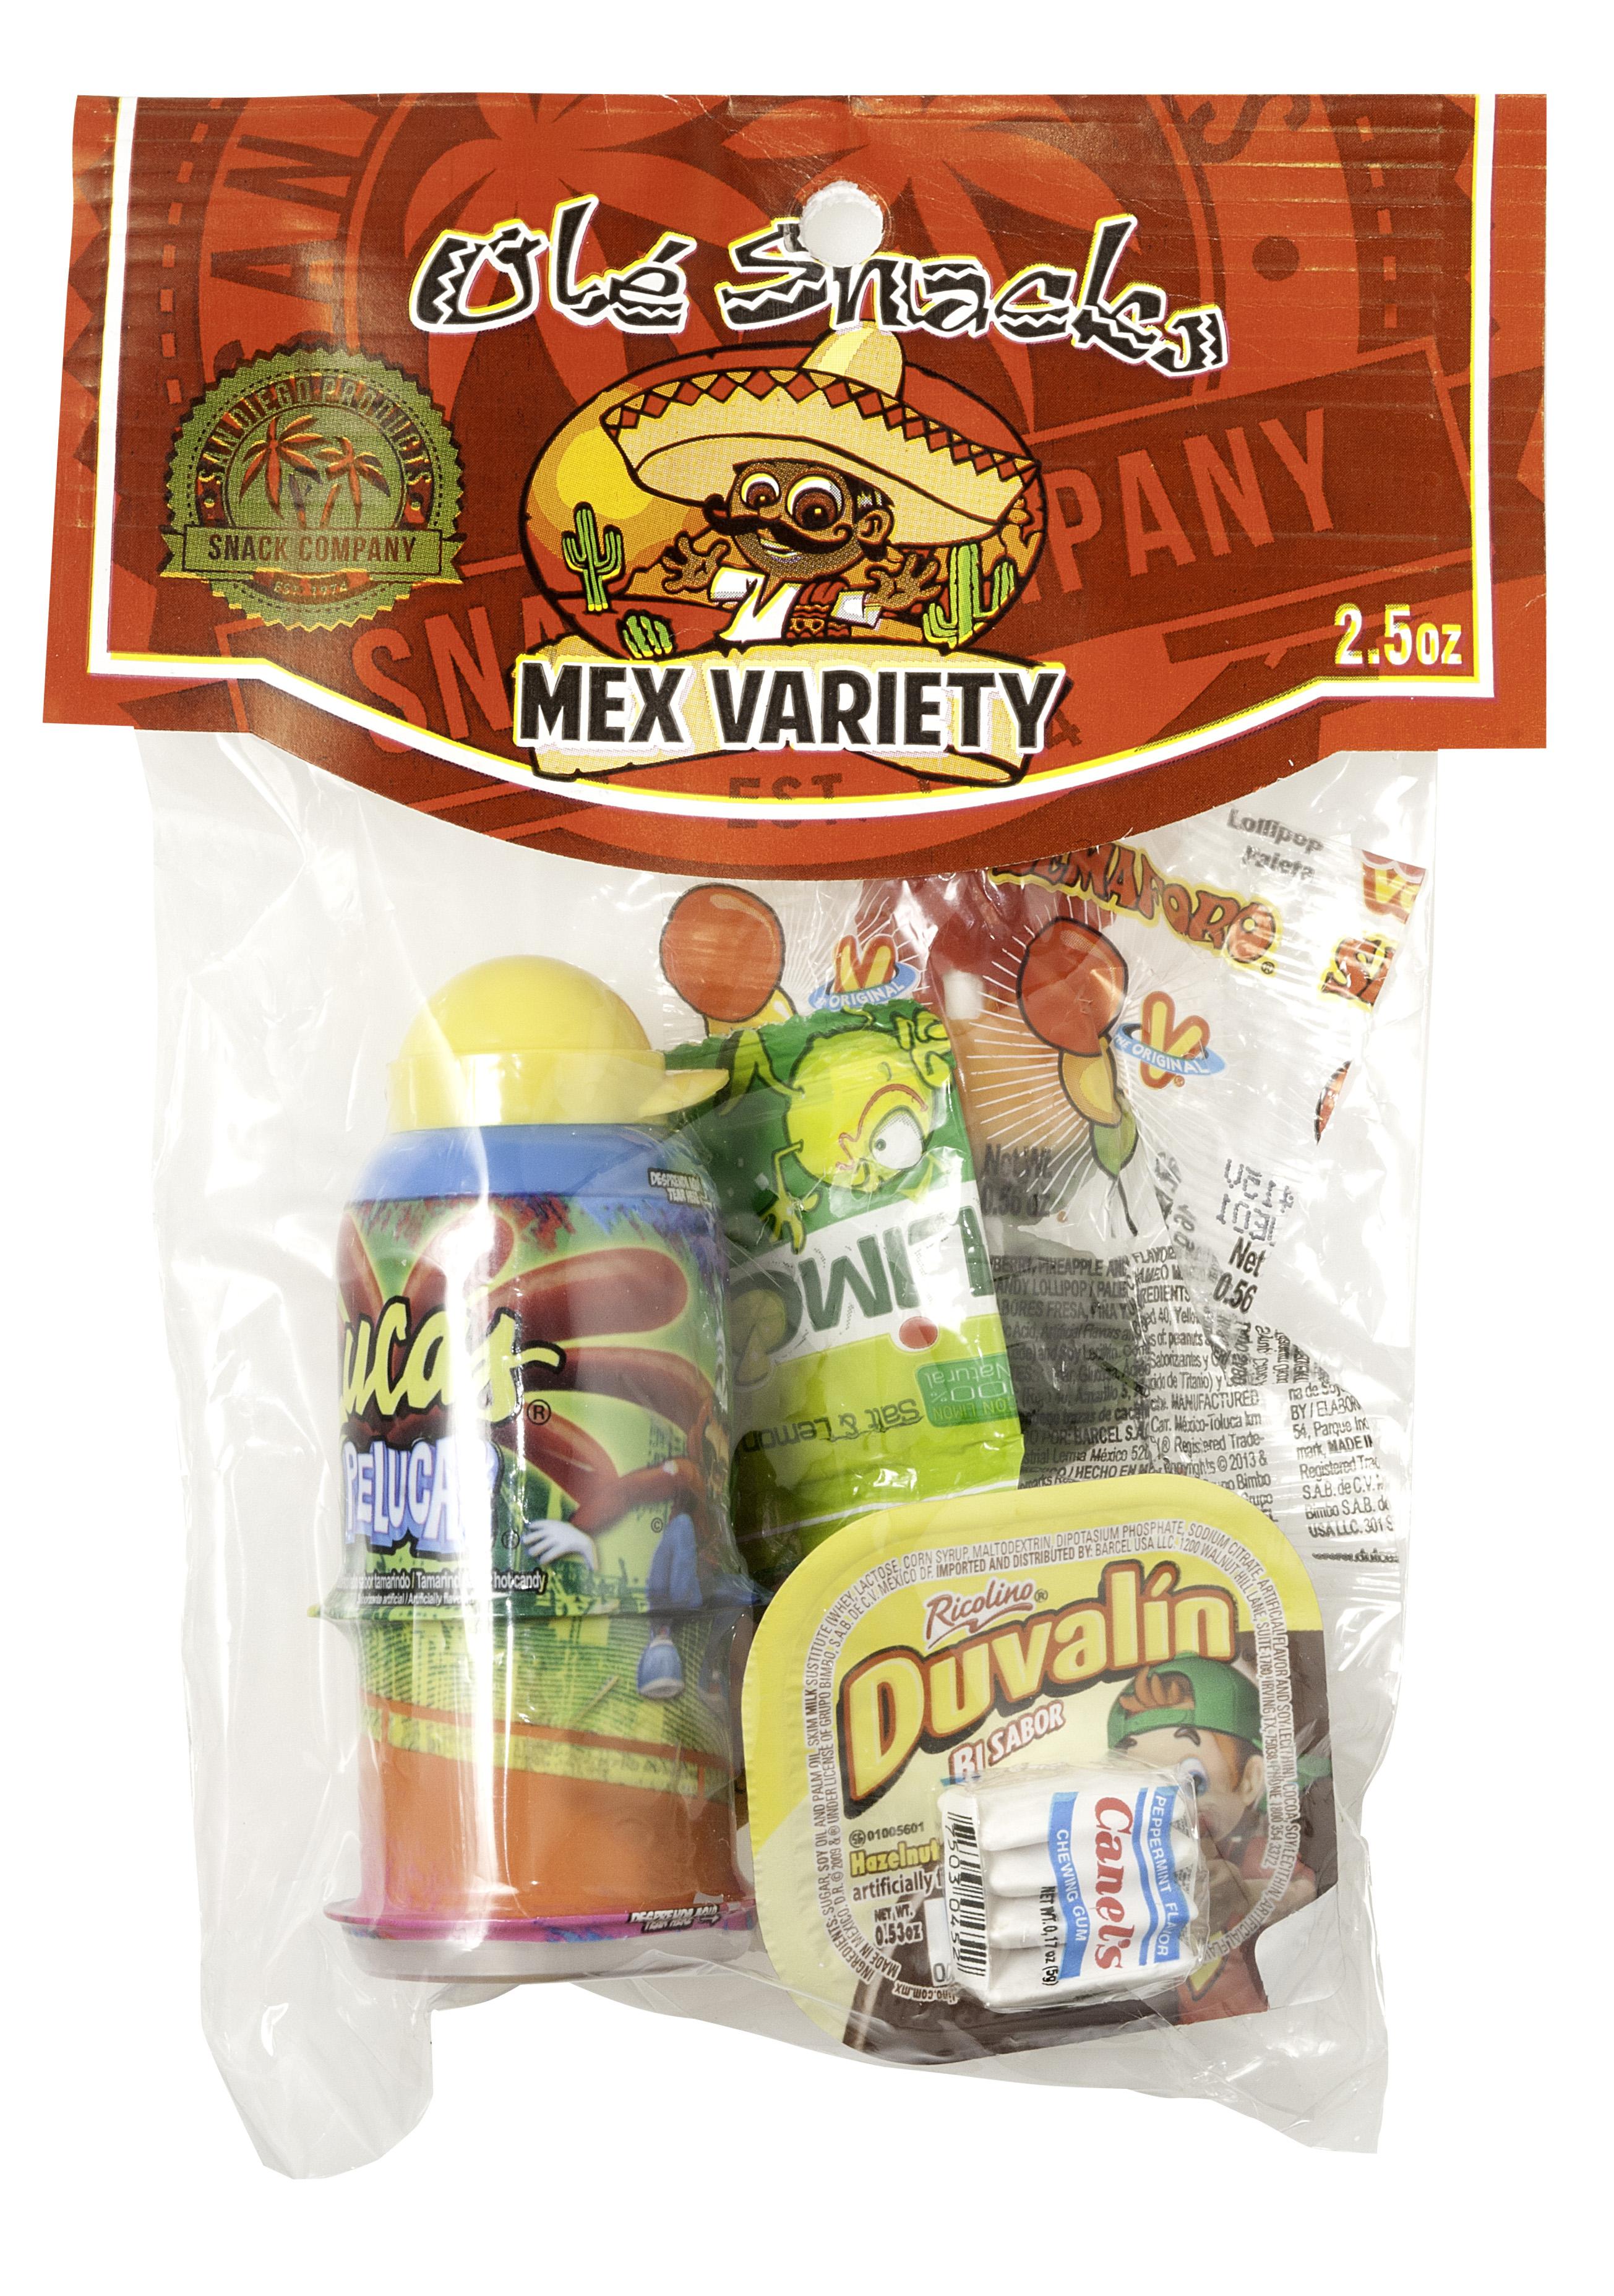 ole snacks mex variety